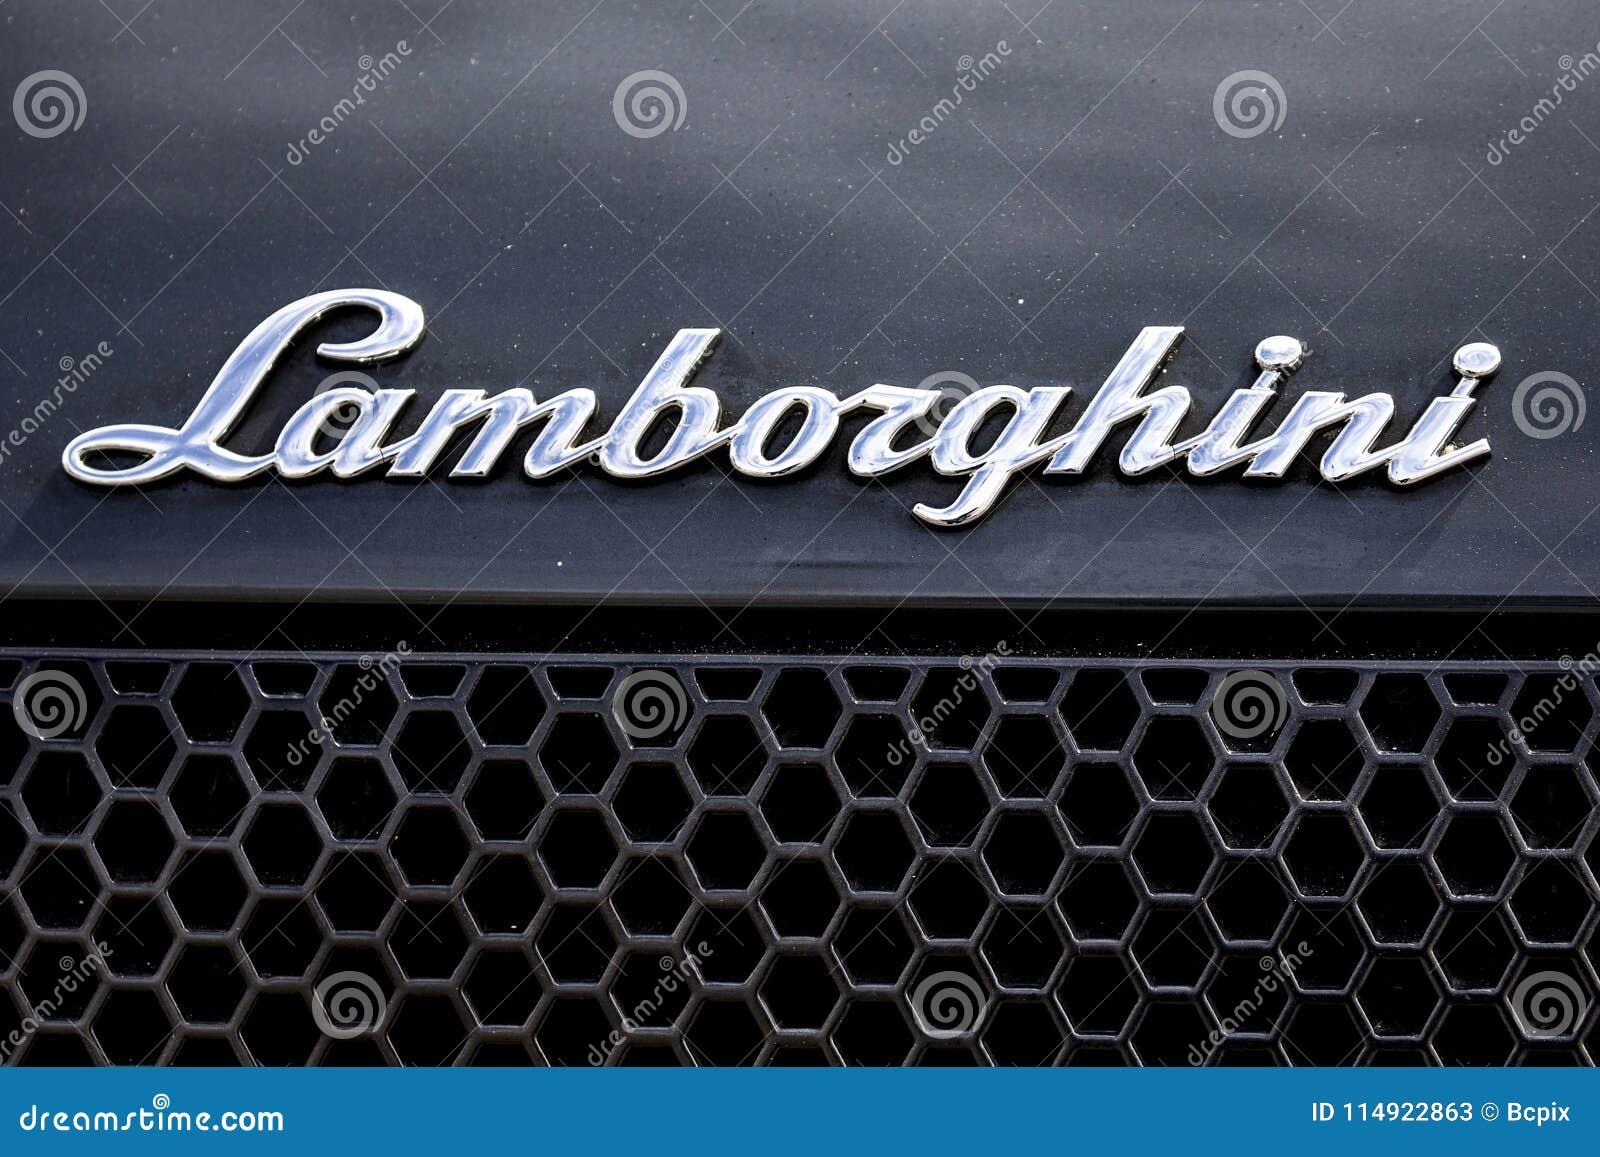 Lamborghini Script Logo Editorial Stock Photo Image Of Fast 114922863